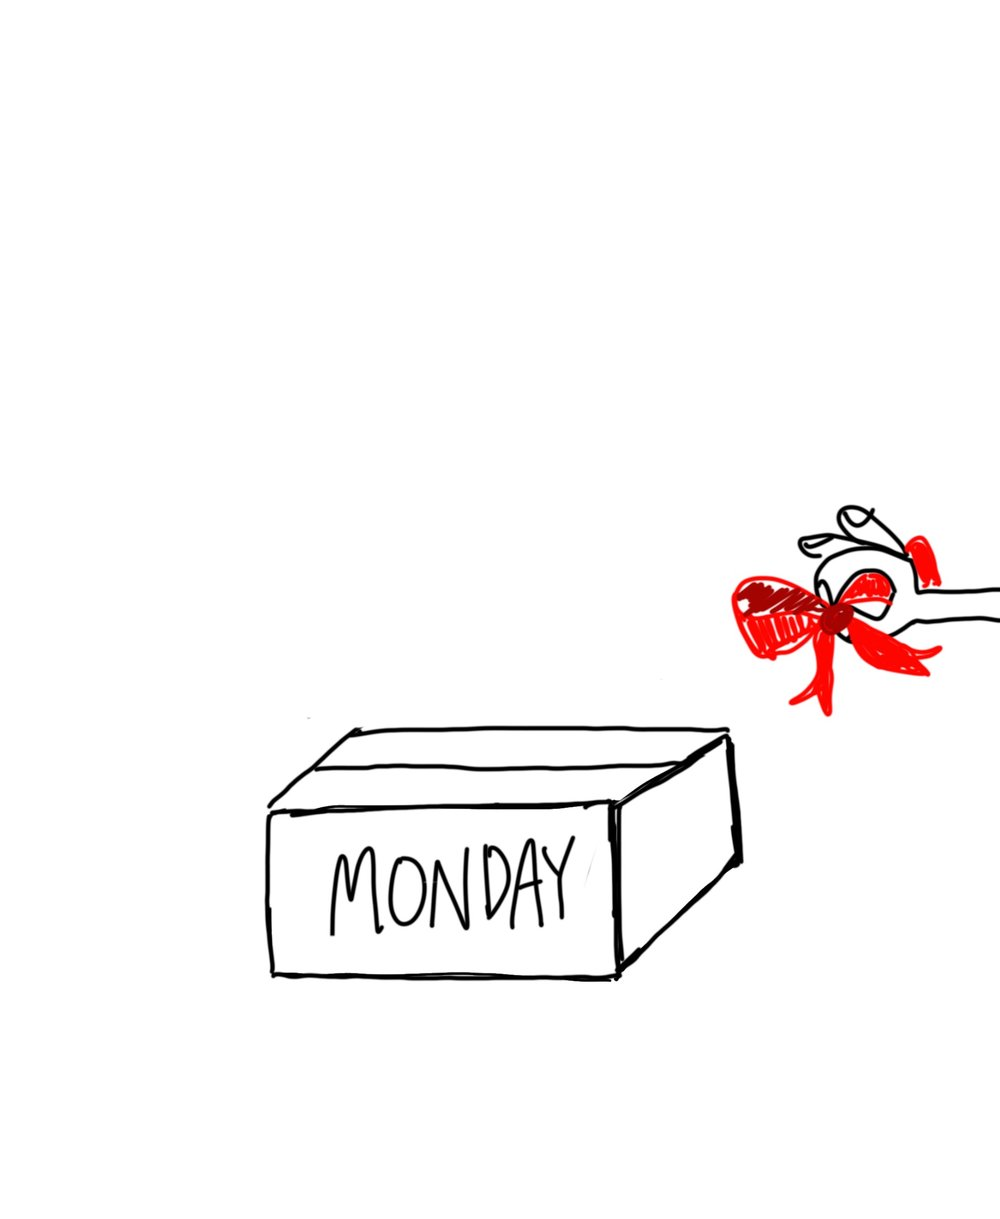 Mondays 9.jpg